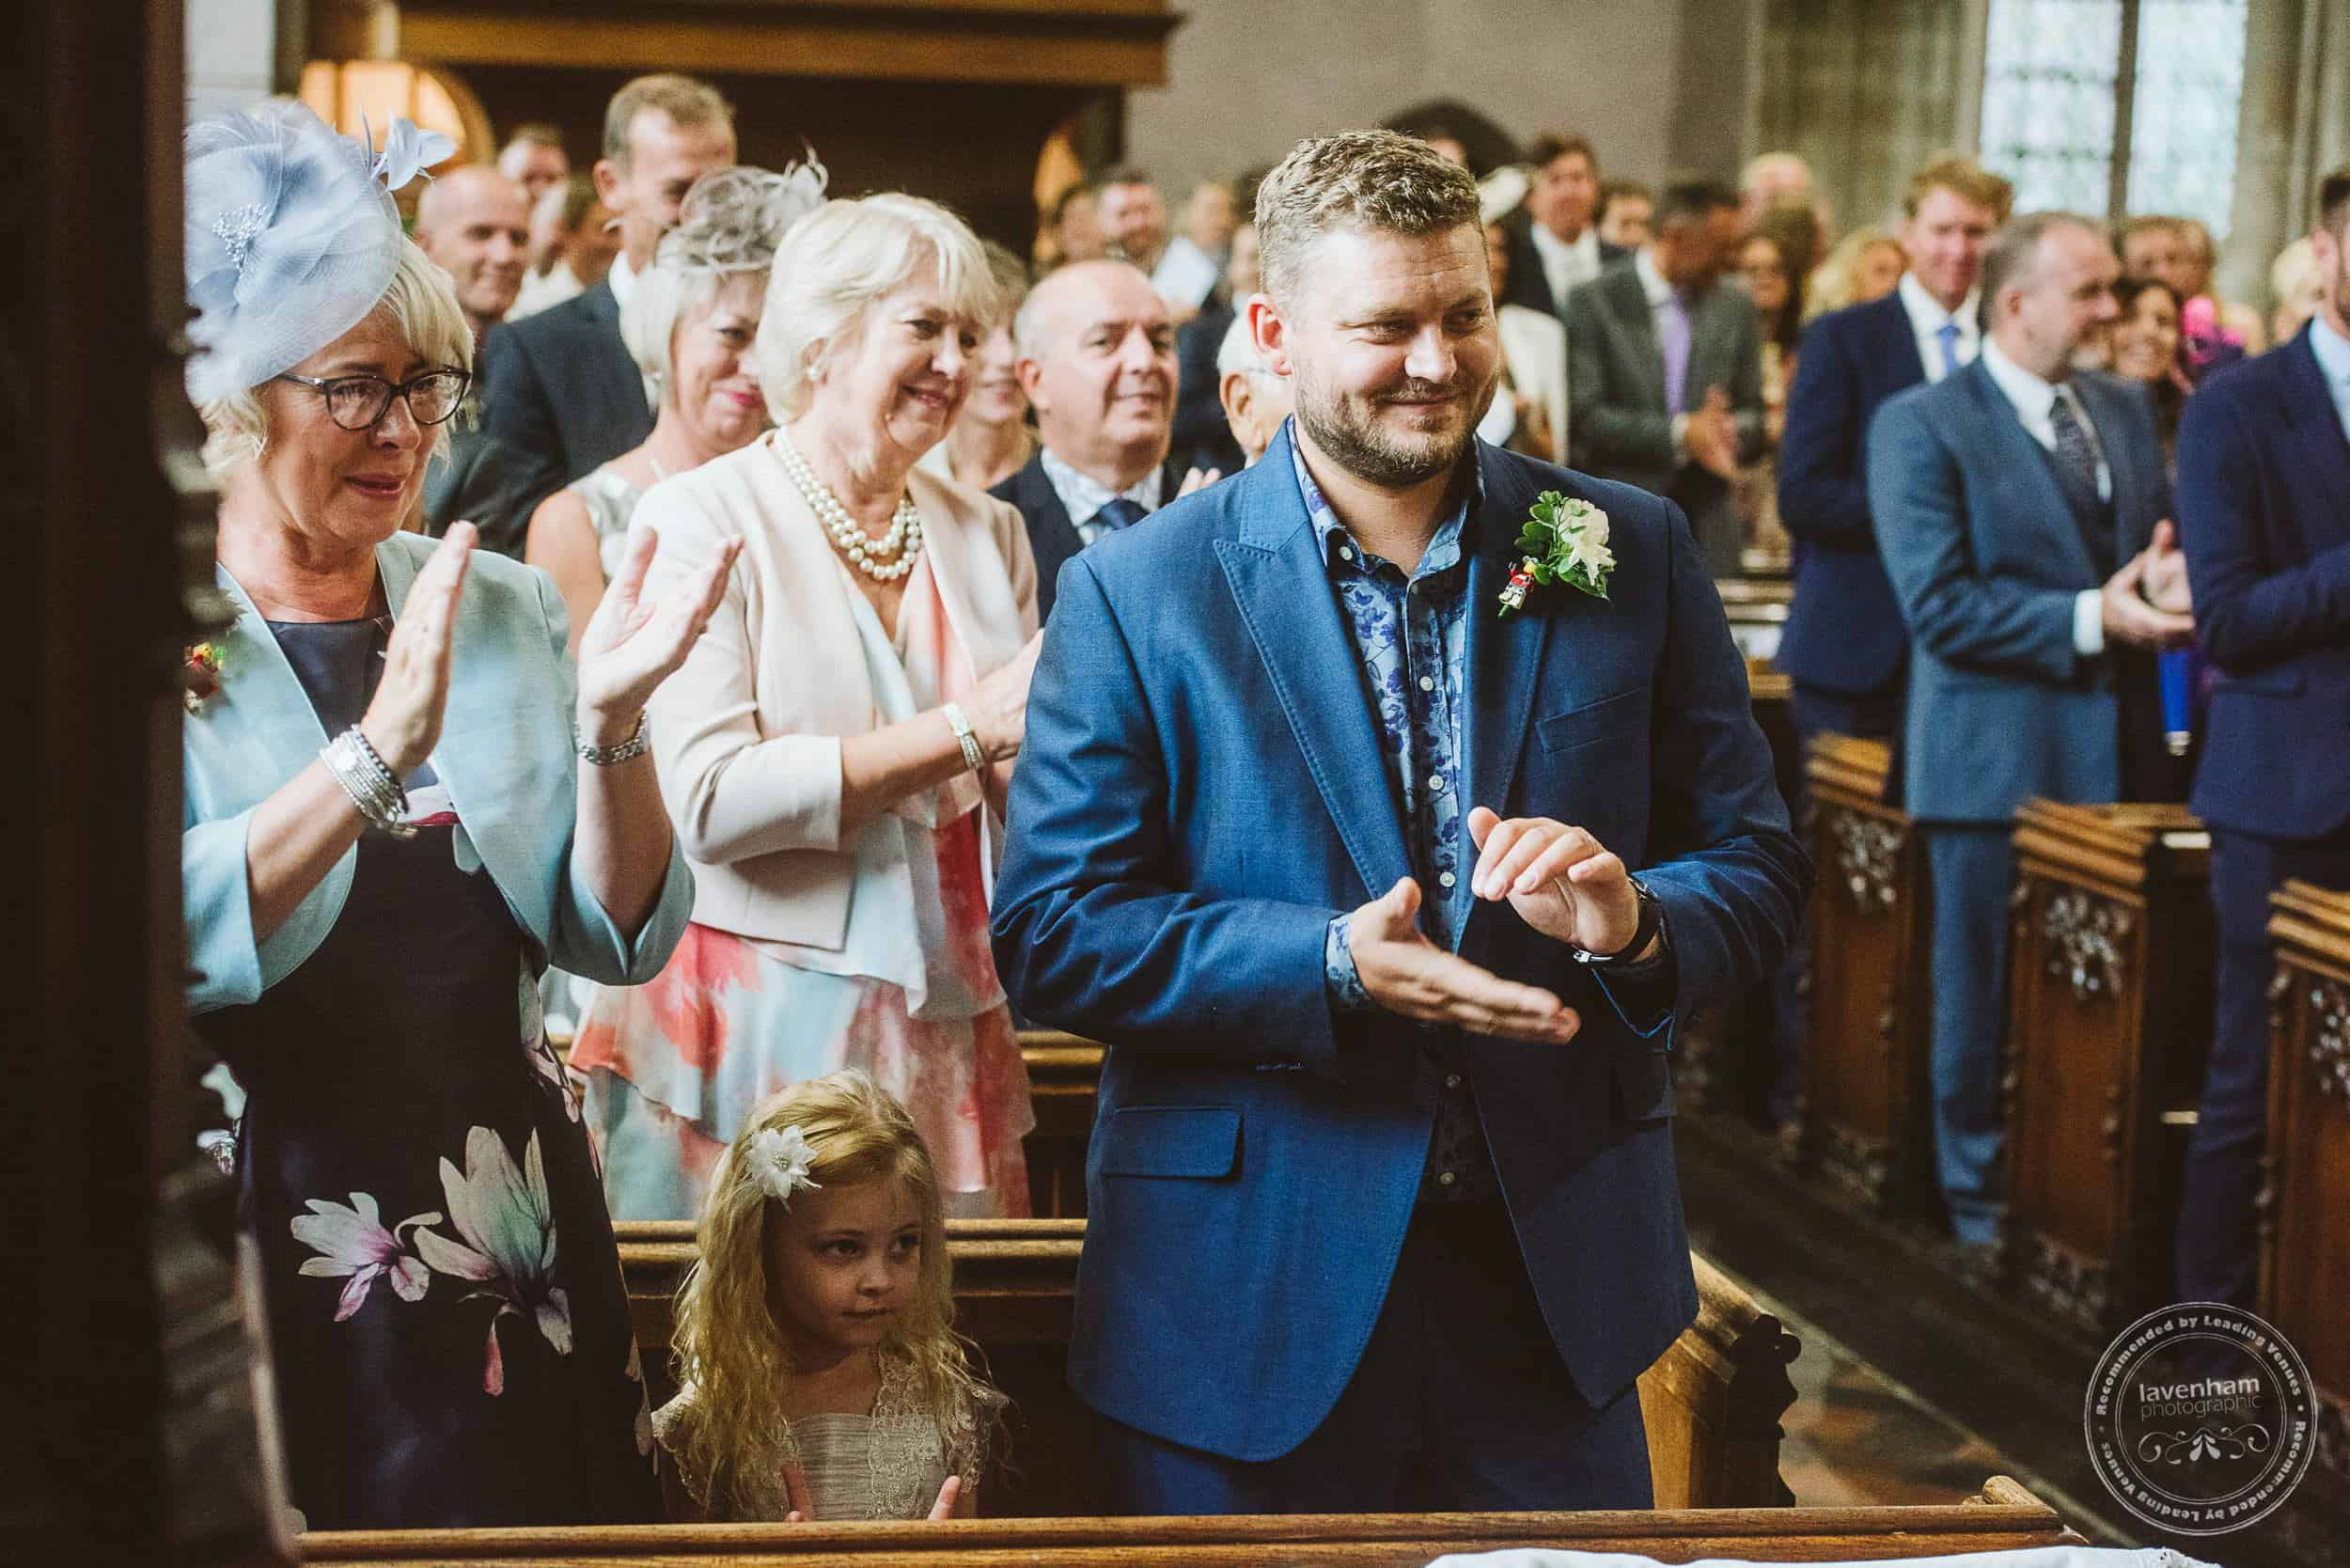 180818 Marks Hall Wedding Photography Lavenham Photographic 058